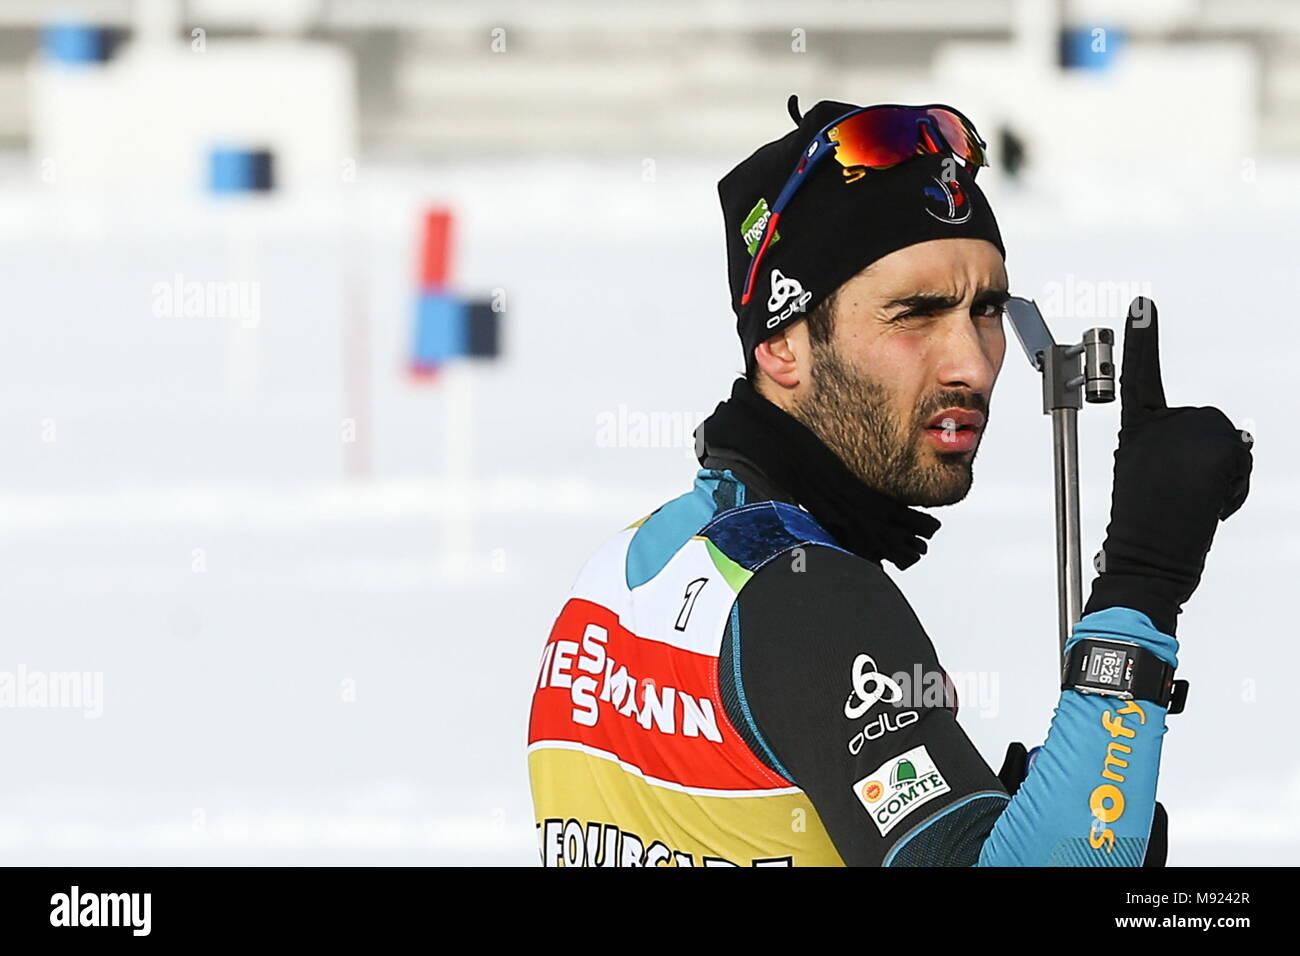 Biathlon in 2017-2018: World Cup 97